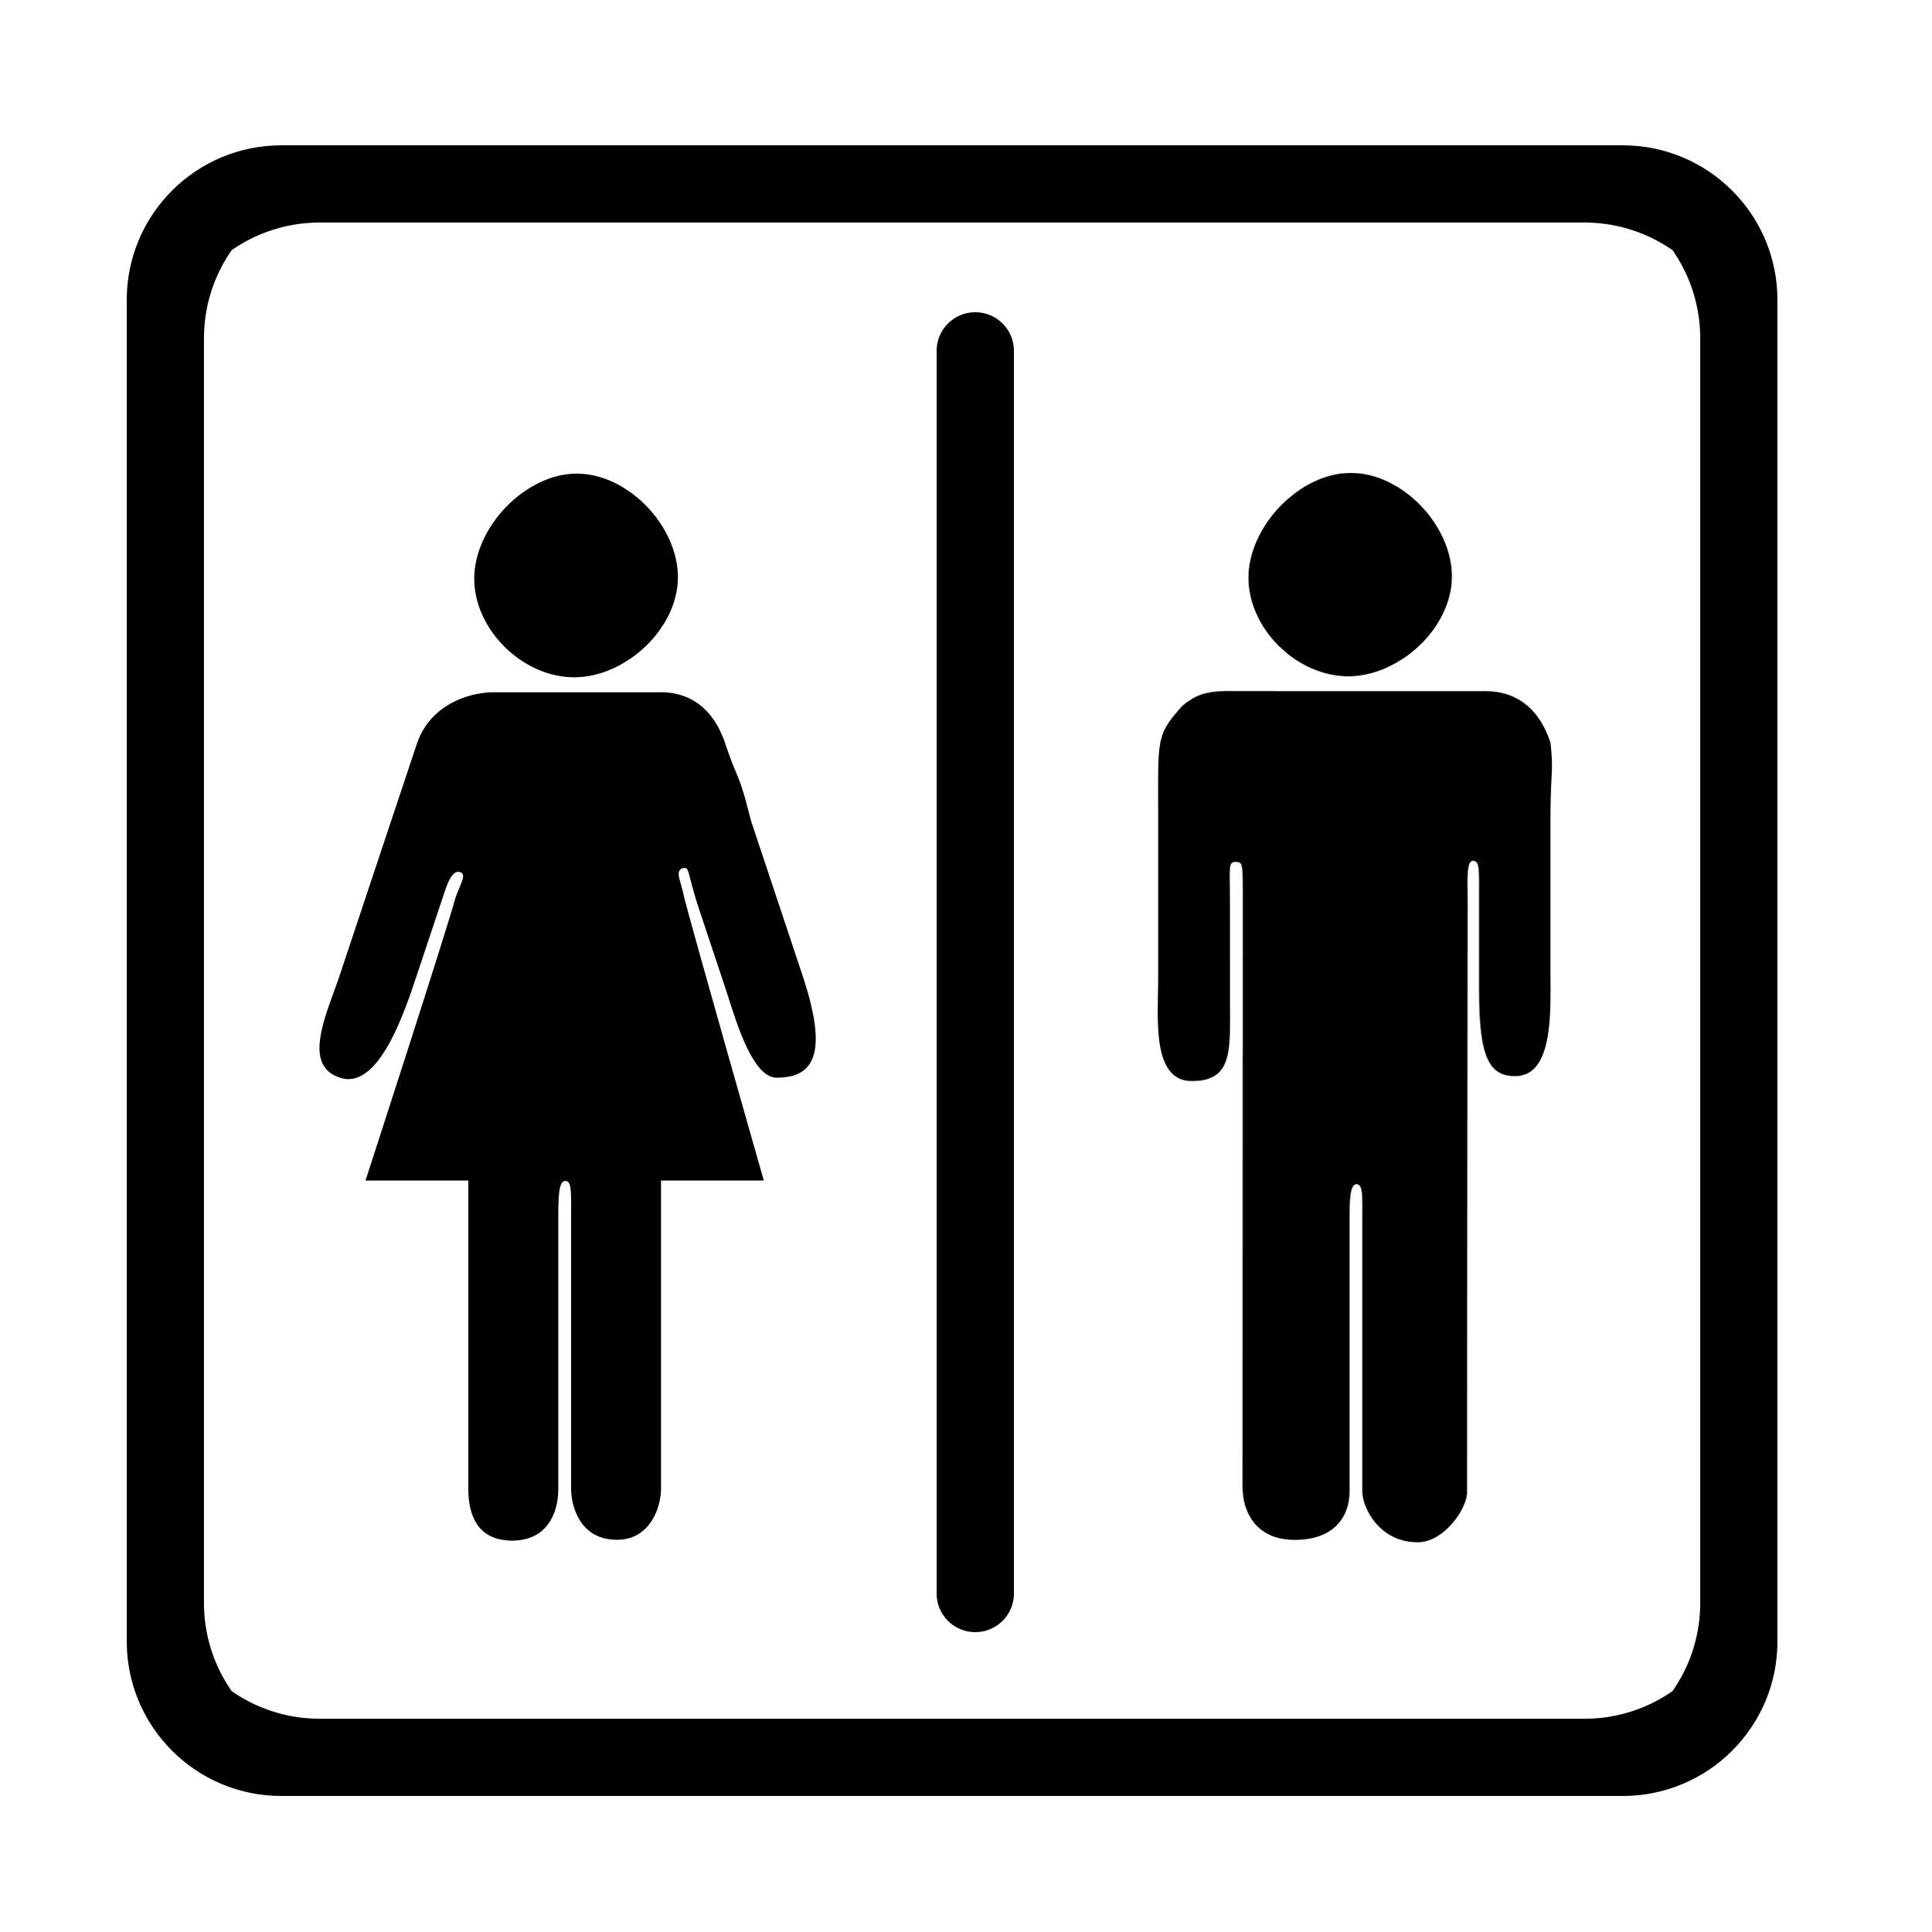 Bathroom door sign cliparts svg freeuse 44+ Clipart Bathroom | ClipartLook svg freeuse